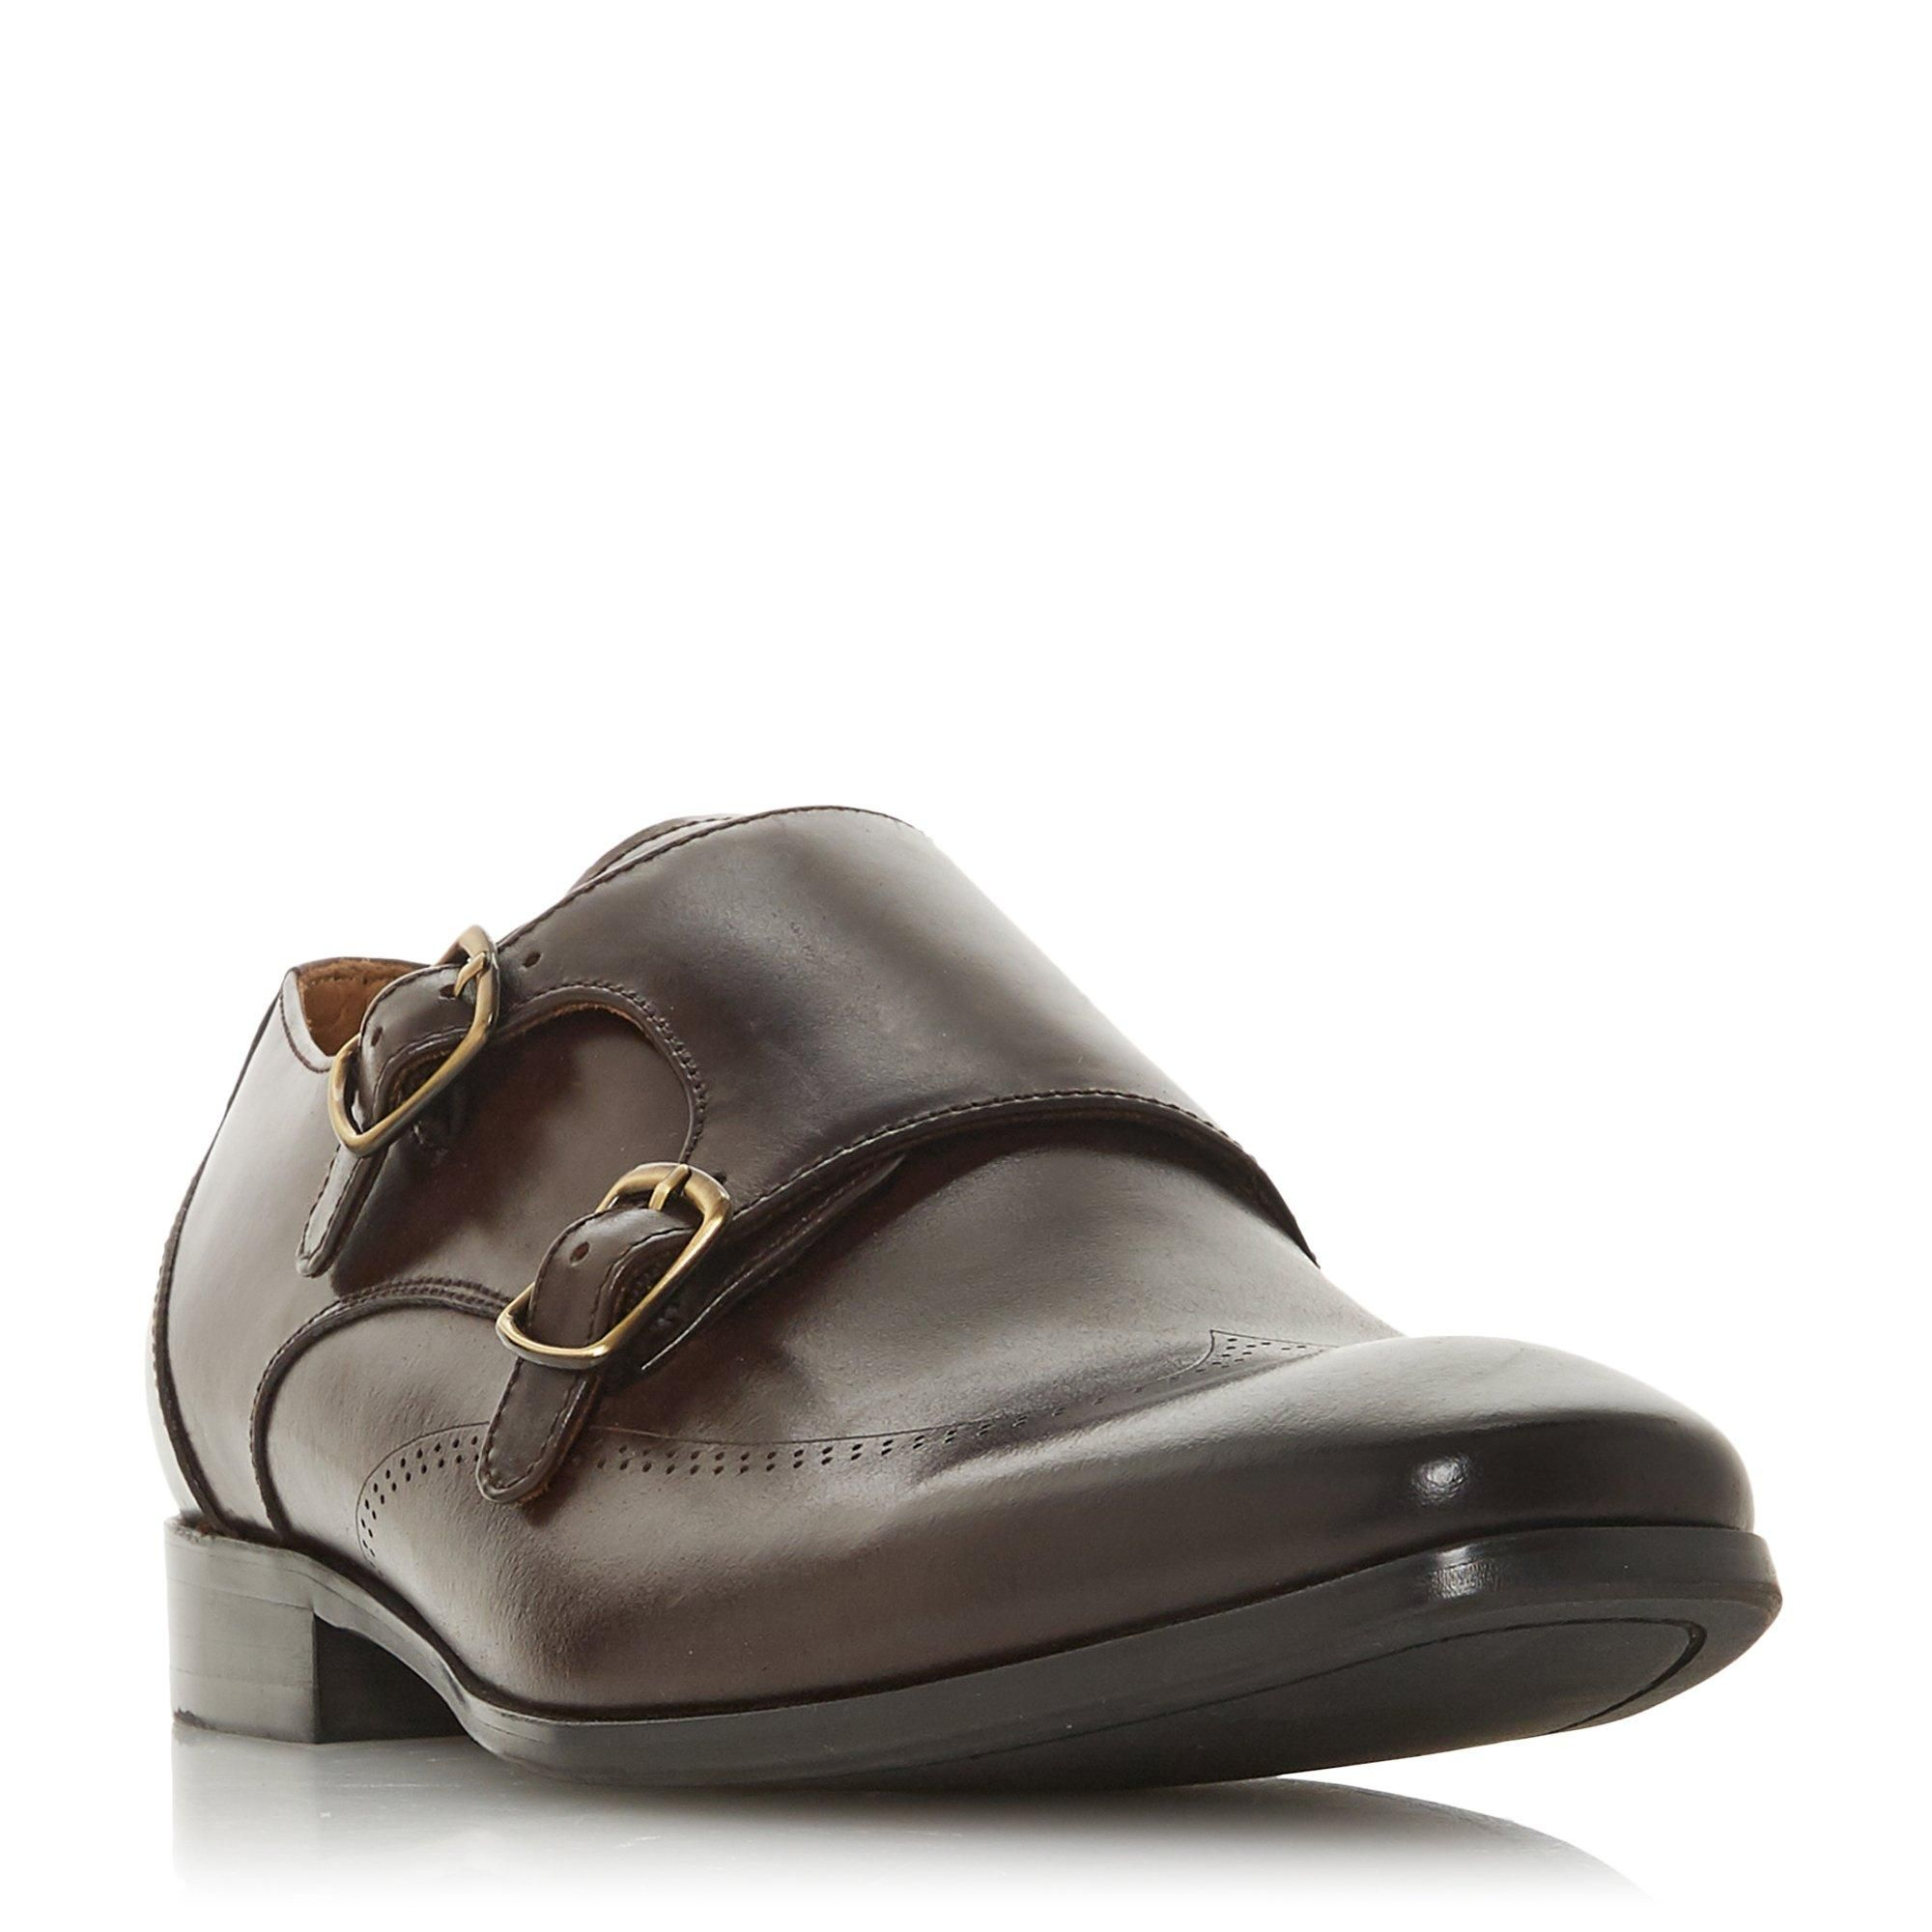 Dune Mens SASKATOON Double Buckle Brogue Detail Monk Shoe